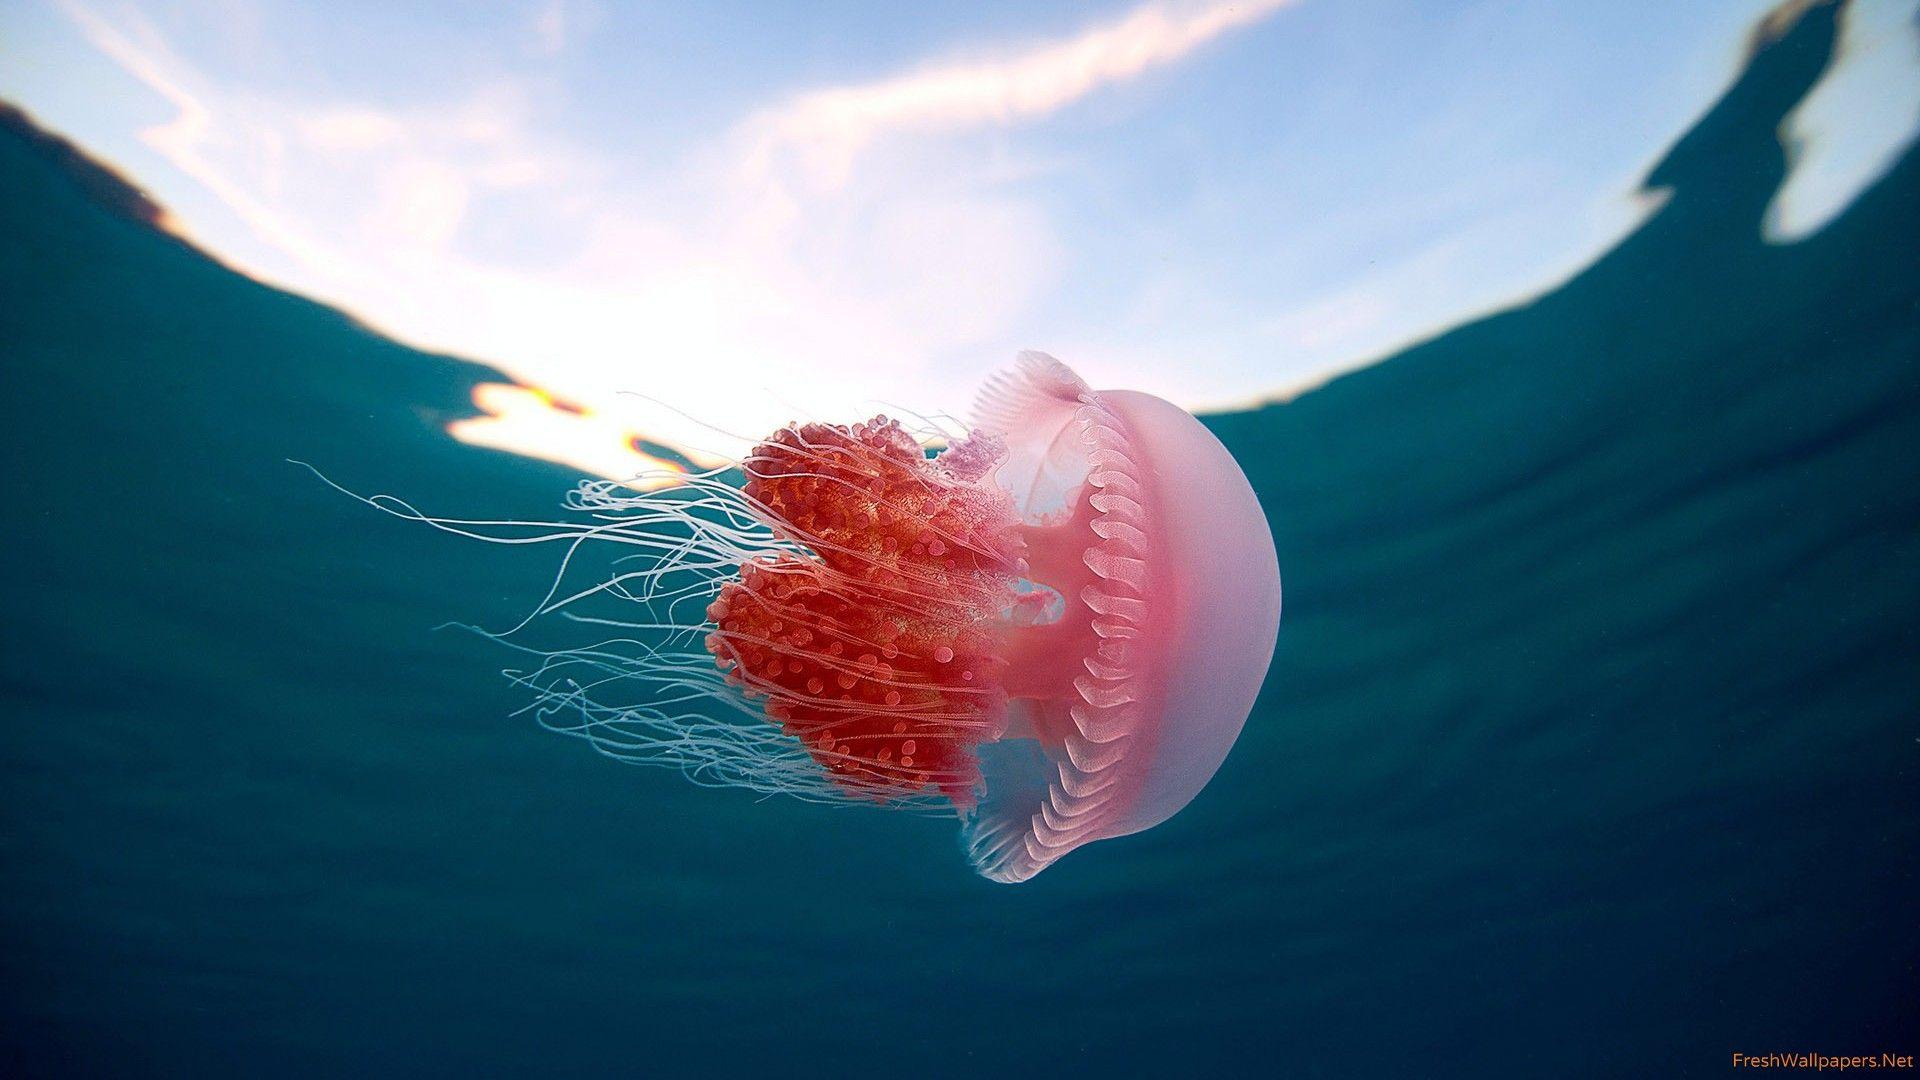 Jellyfish Free Download Wallpaper